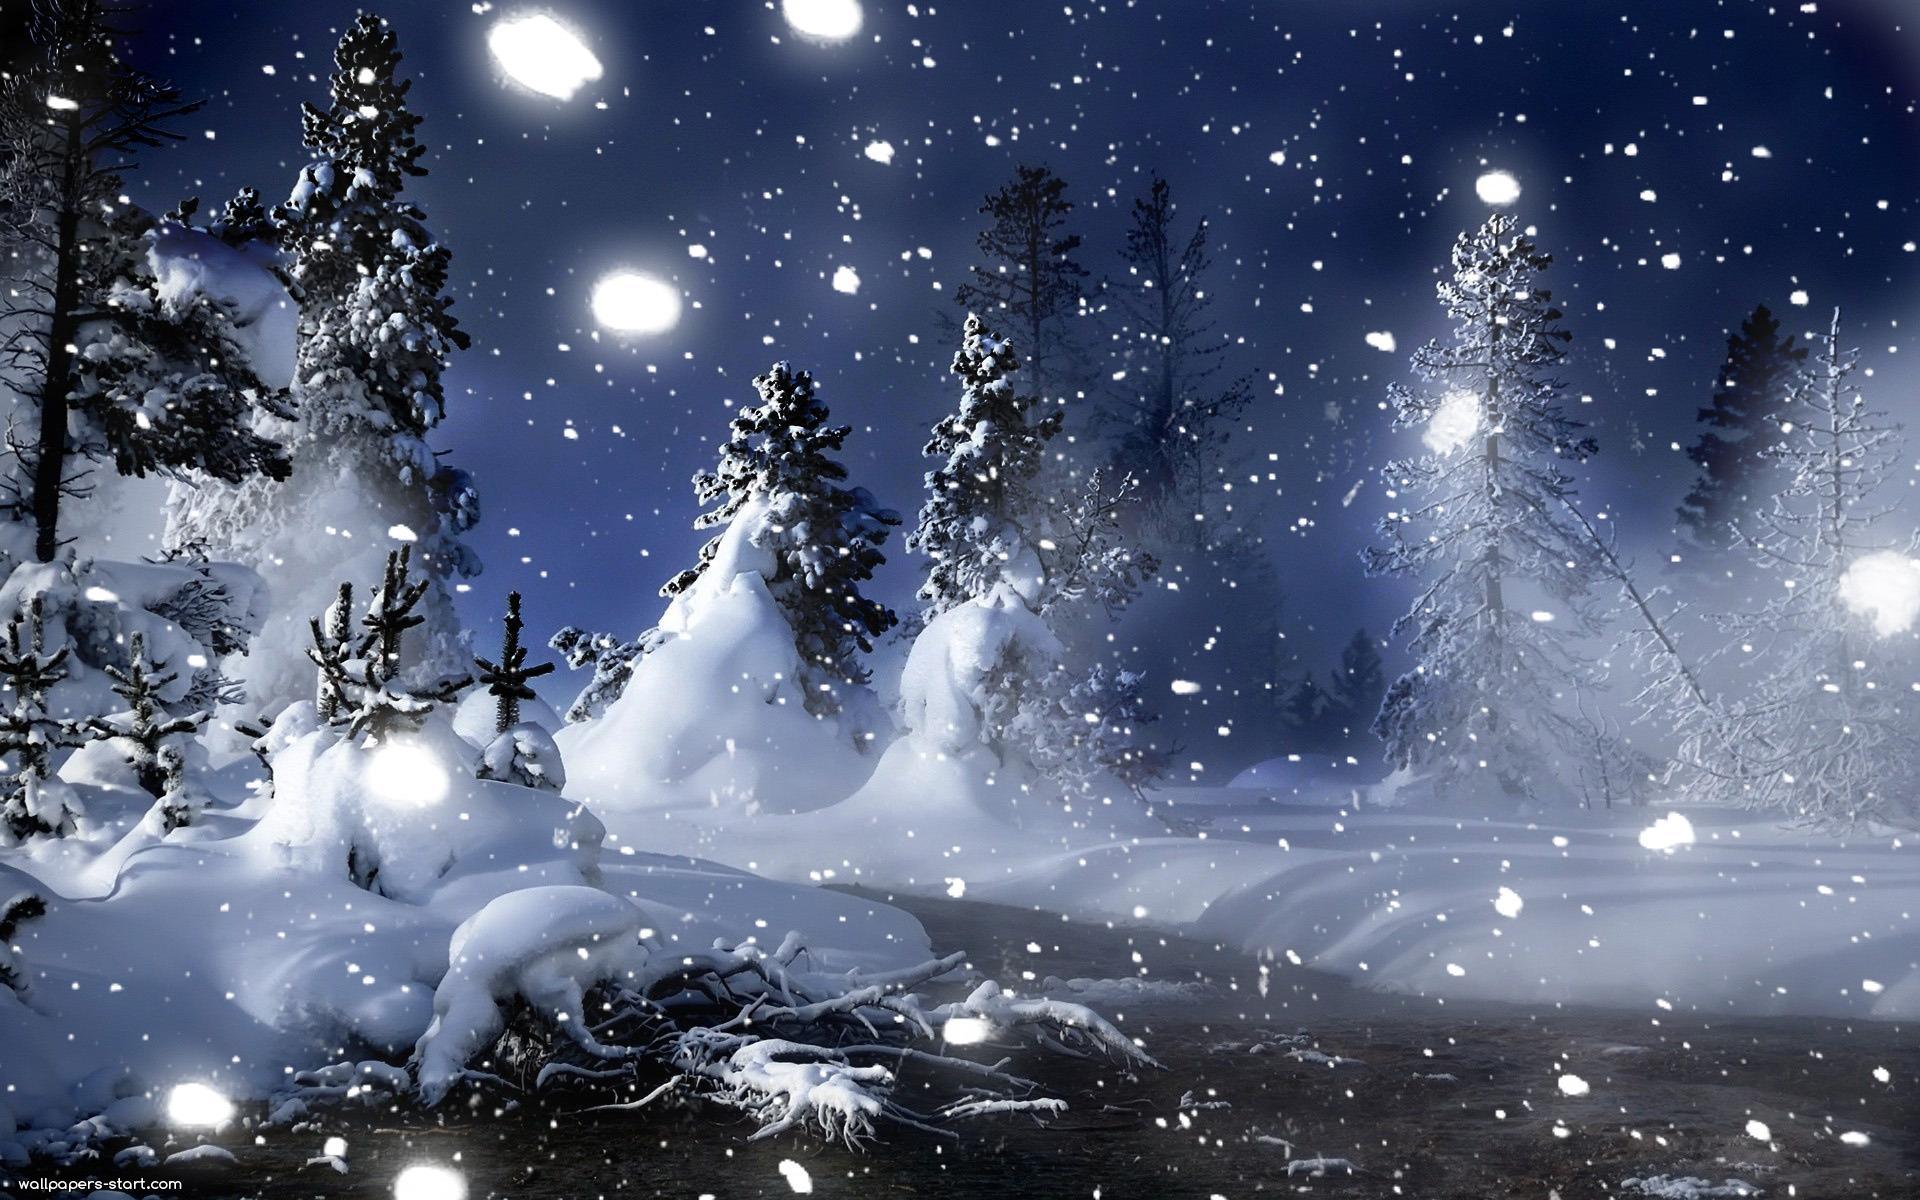 Romantic Winter Night Wallpapers Mobile Fond D écran